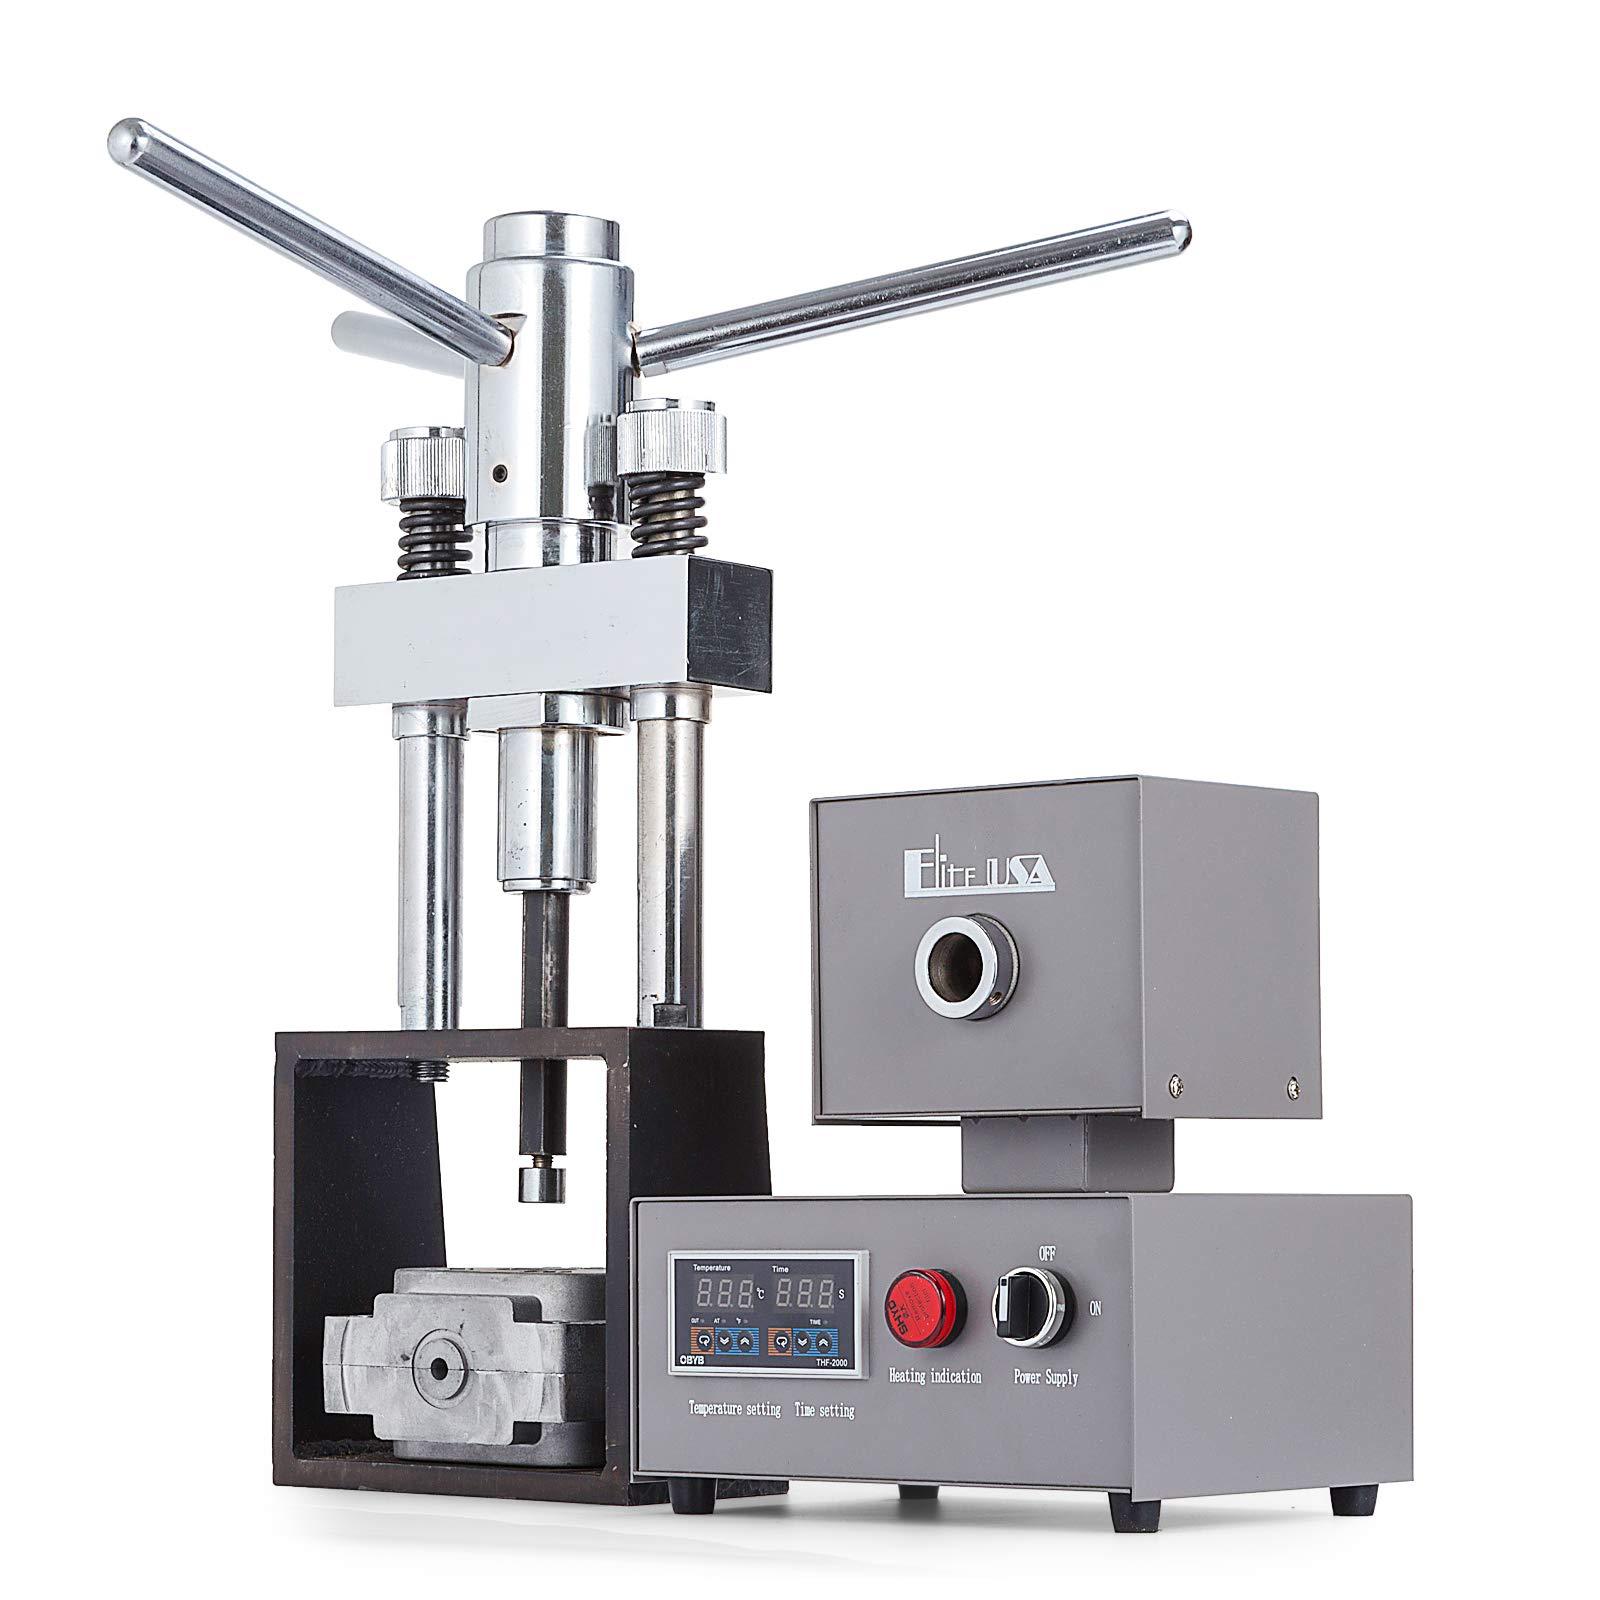 VEVOR 400W Denture Machine 110V Denture Injection System Flexible Denture Machine Dental laboratory Equipment for Making Flexible Removable Partial Dentures